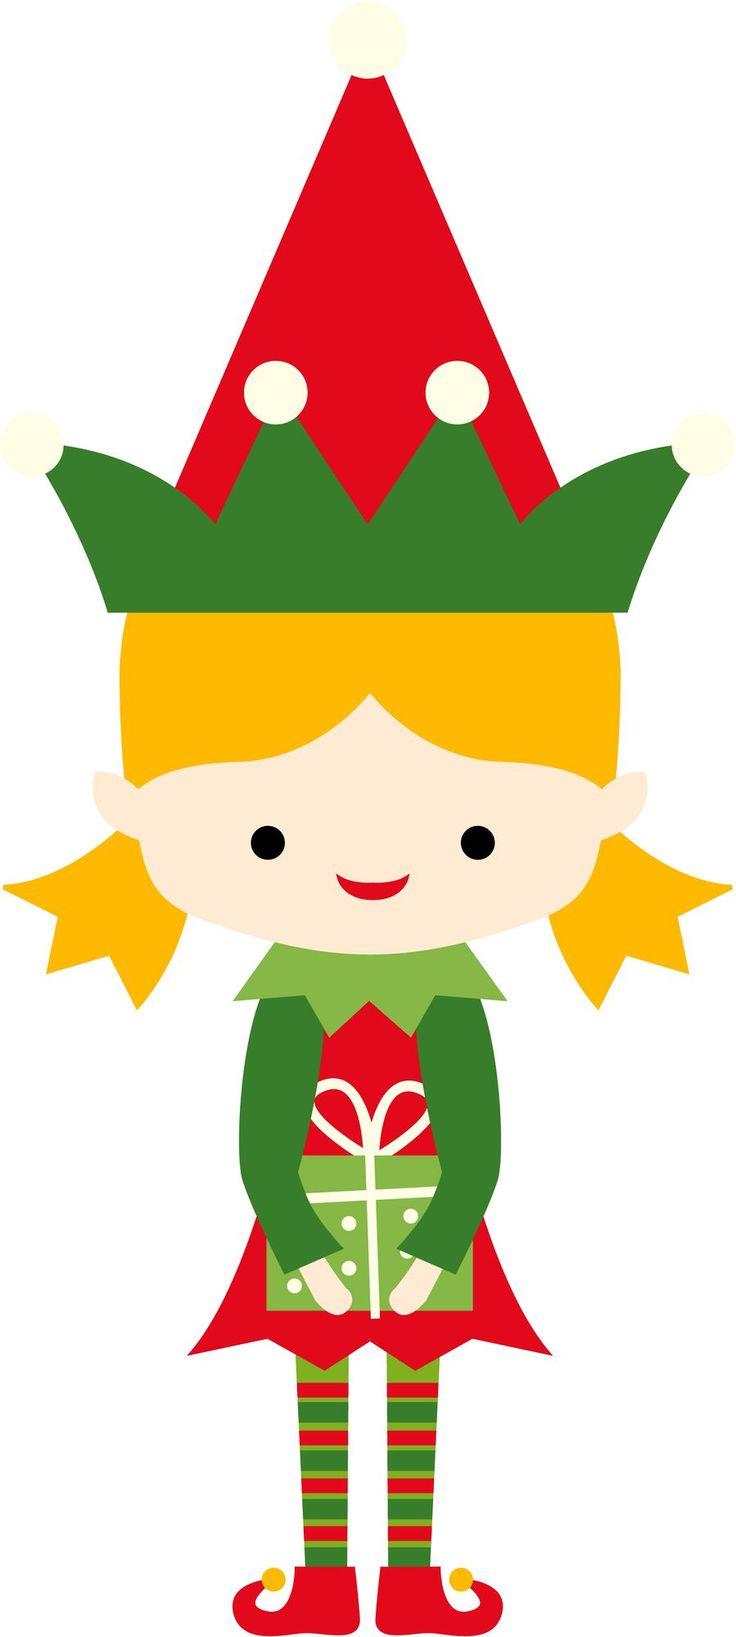 736x1637 294 Best Christmas Elves. Images On Elves, Christmas